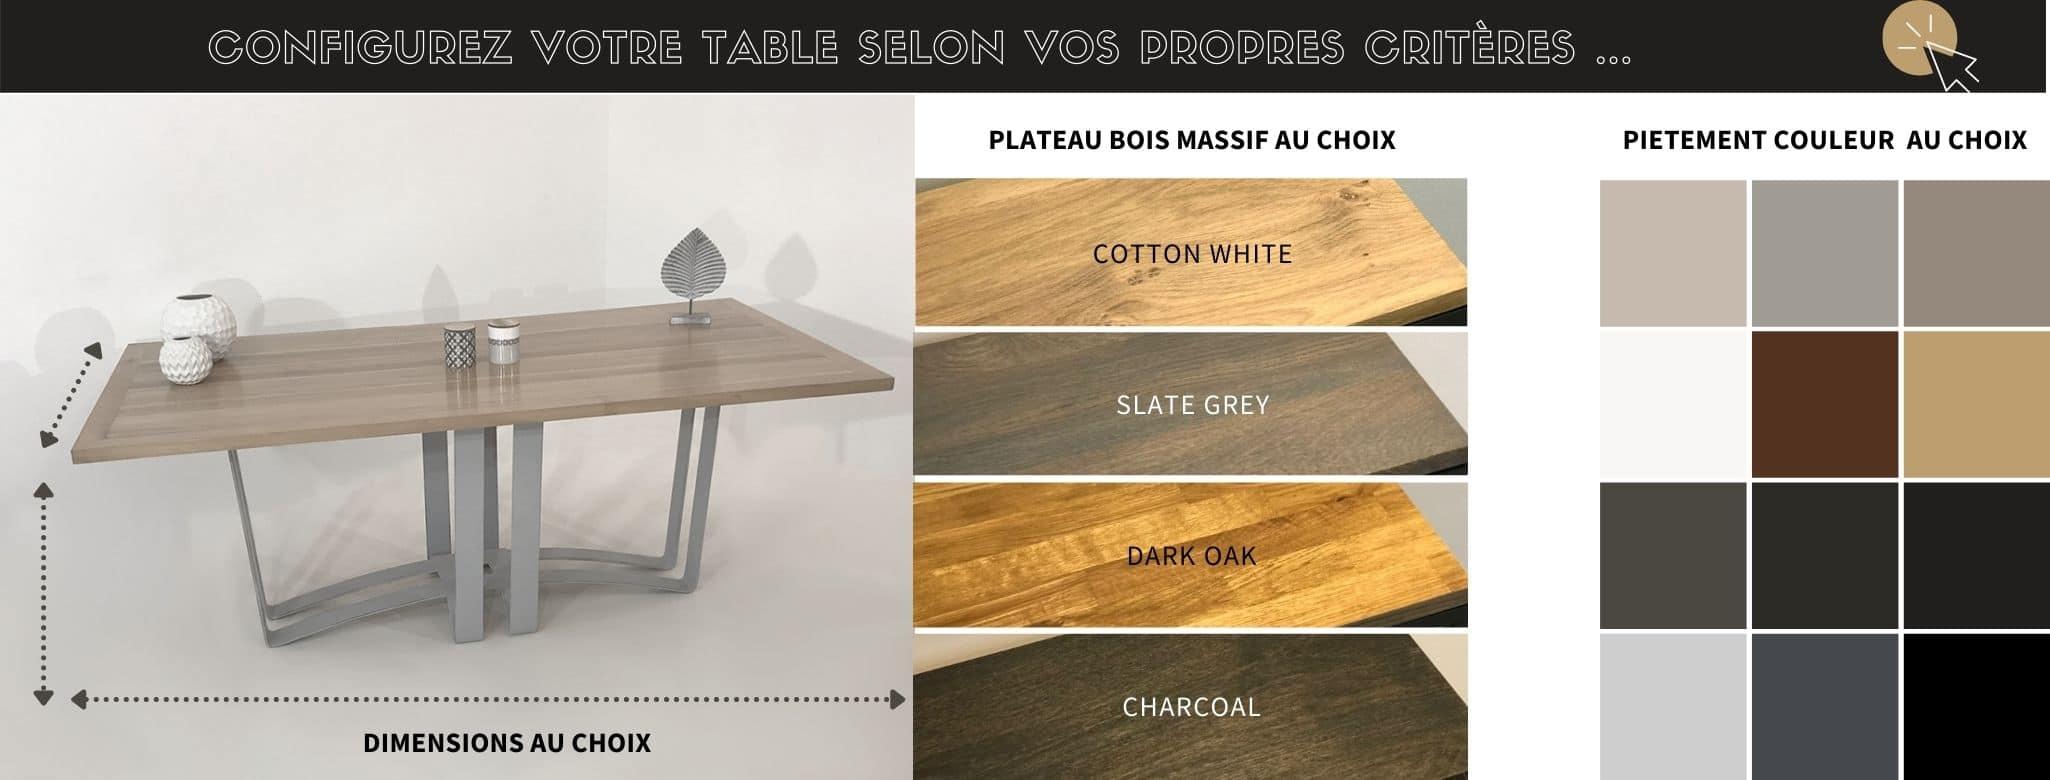 Table design fabrication artisanale sur-mesure